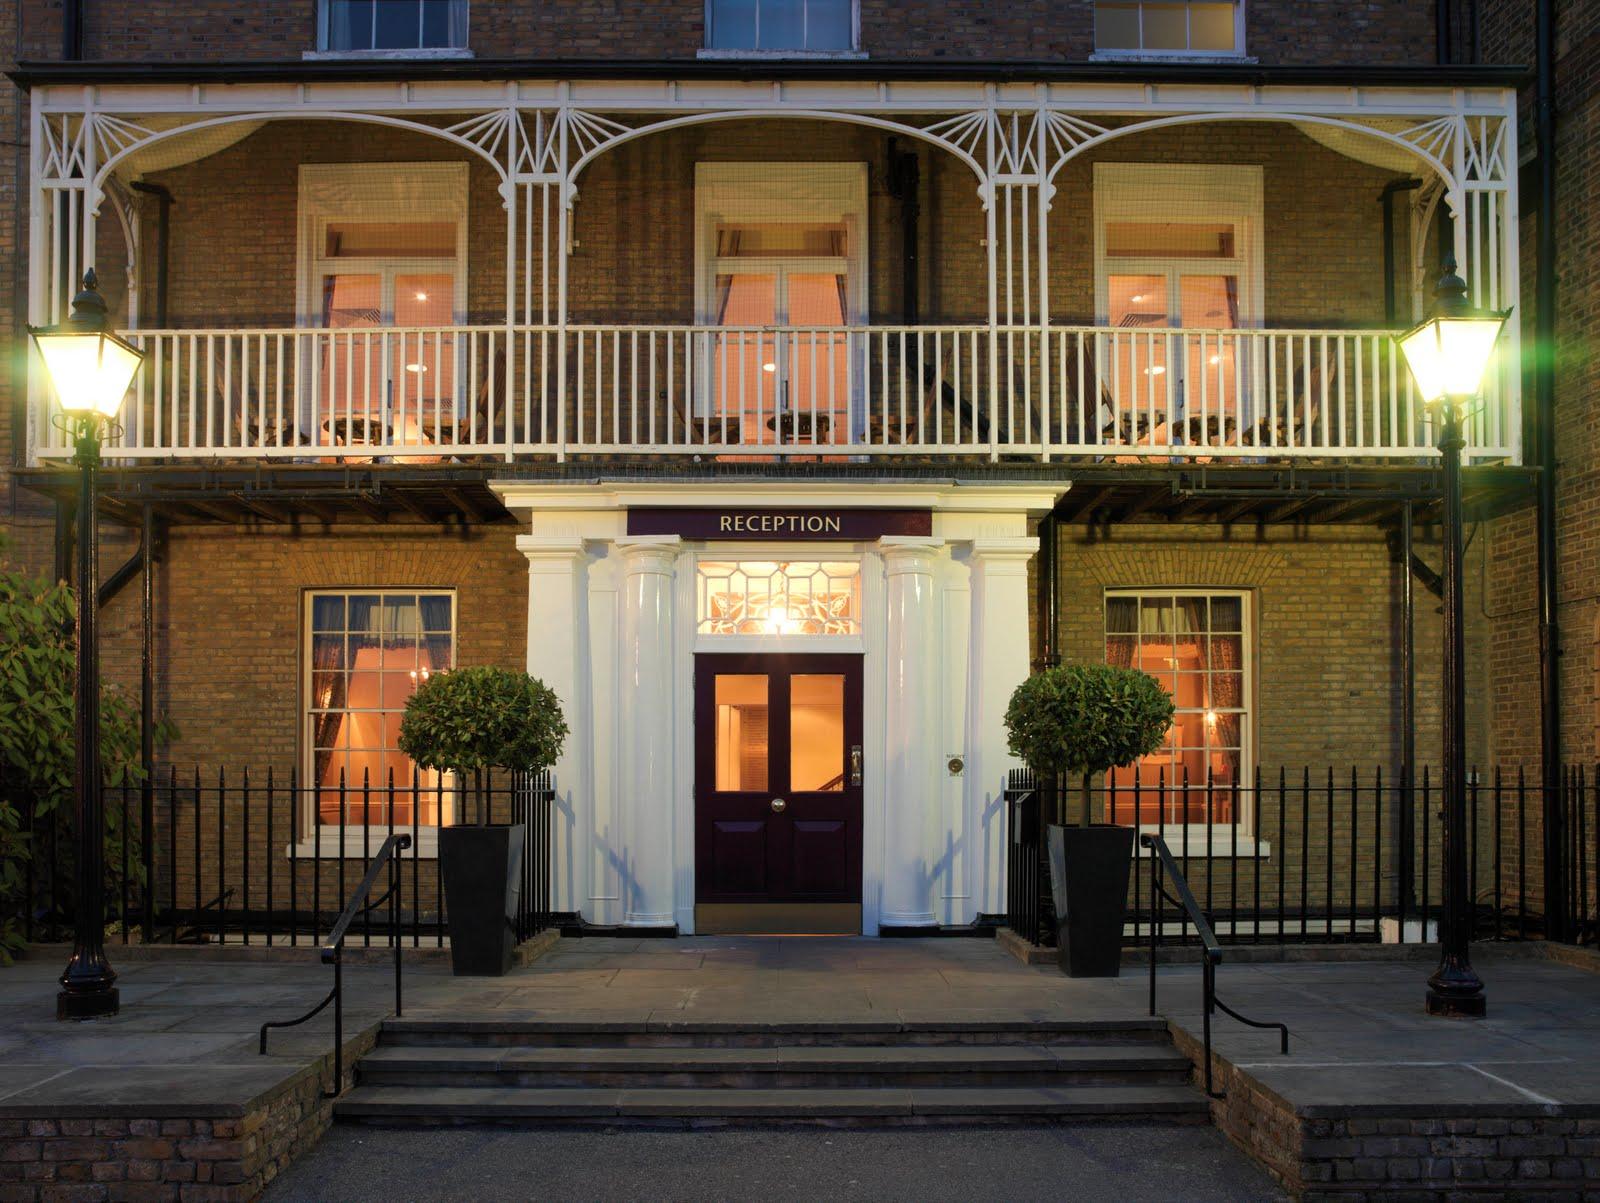 Tom Green Piano Richmond Hill Hotel Wedding Pianist Venue In West London